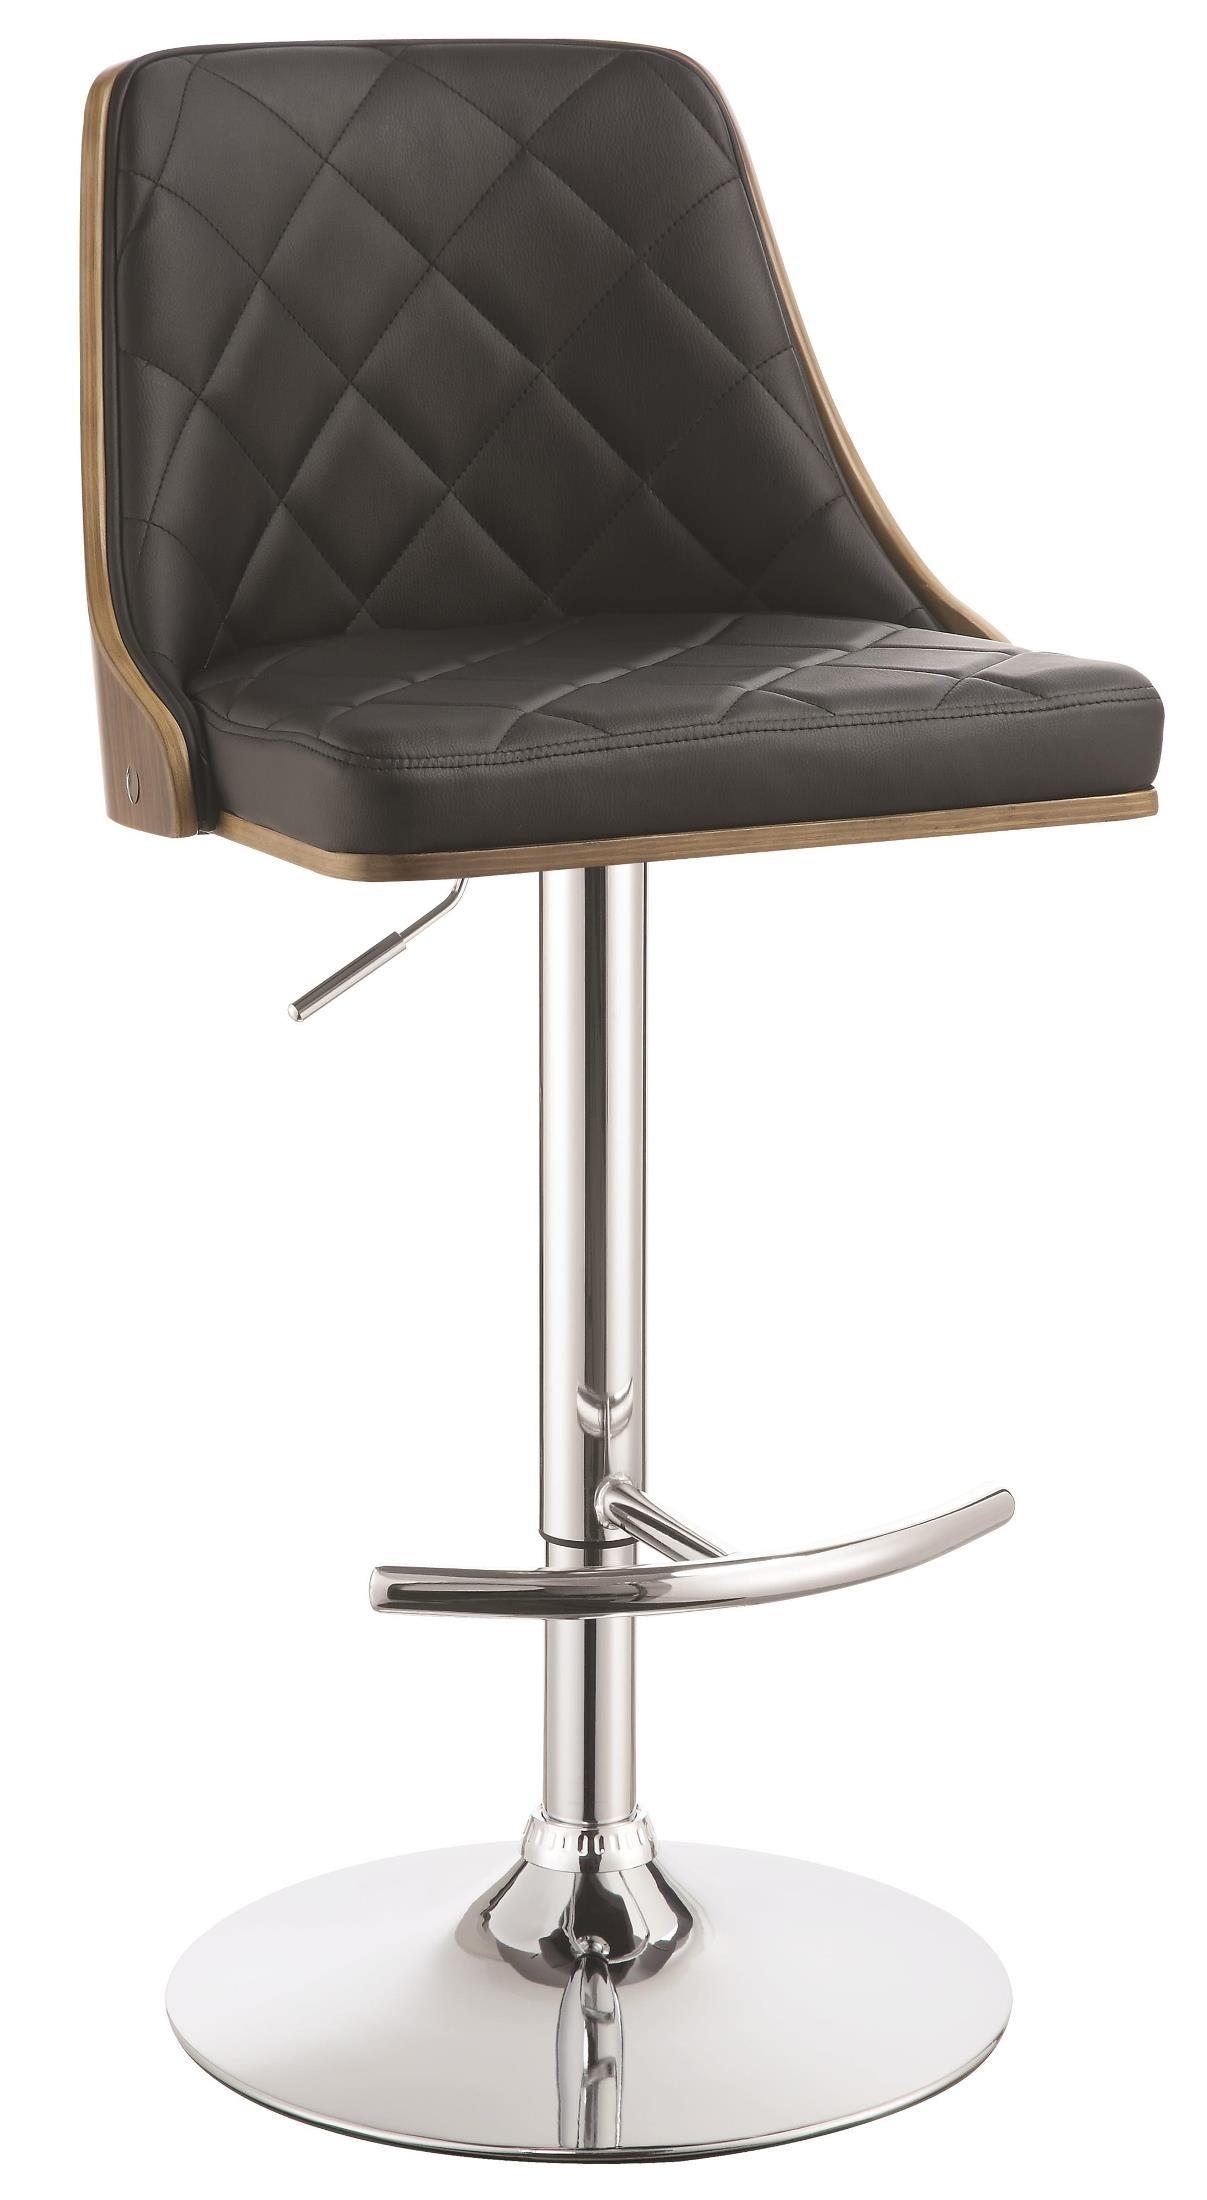 Black Upholstered Adjustable Bar Stool From Coaster